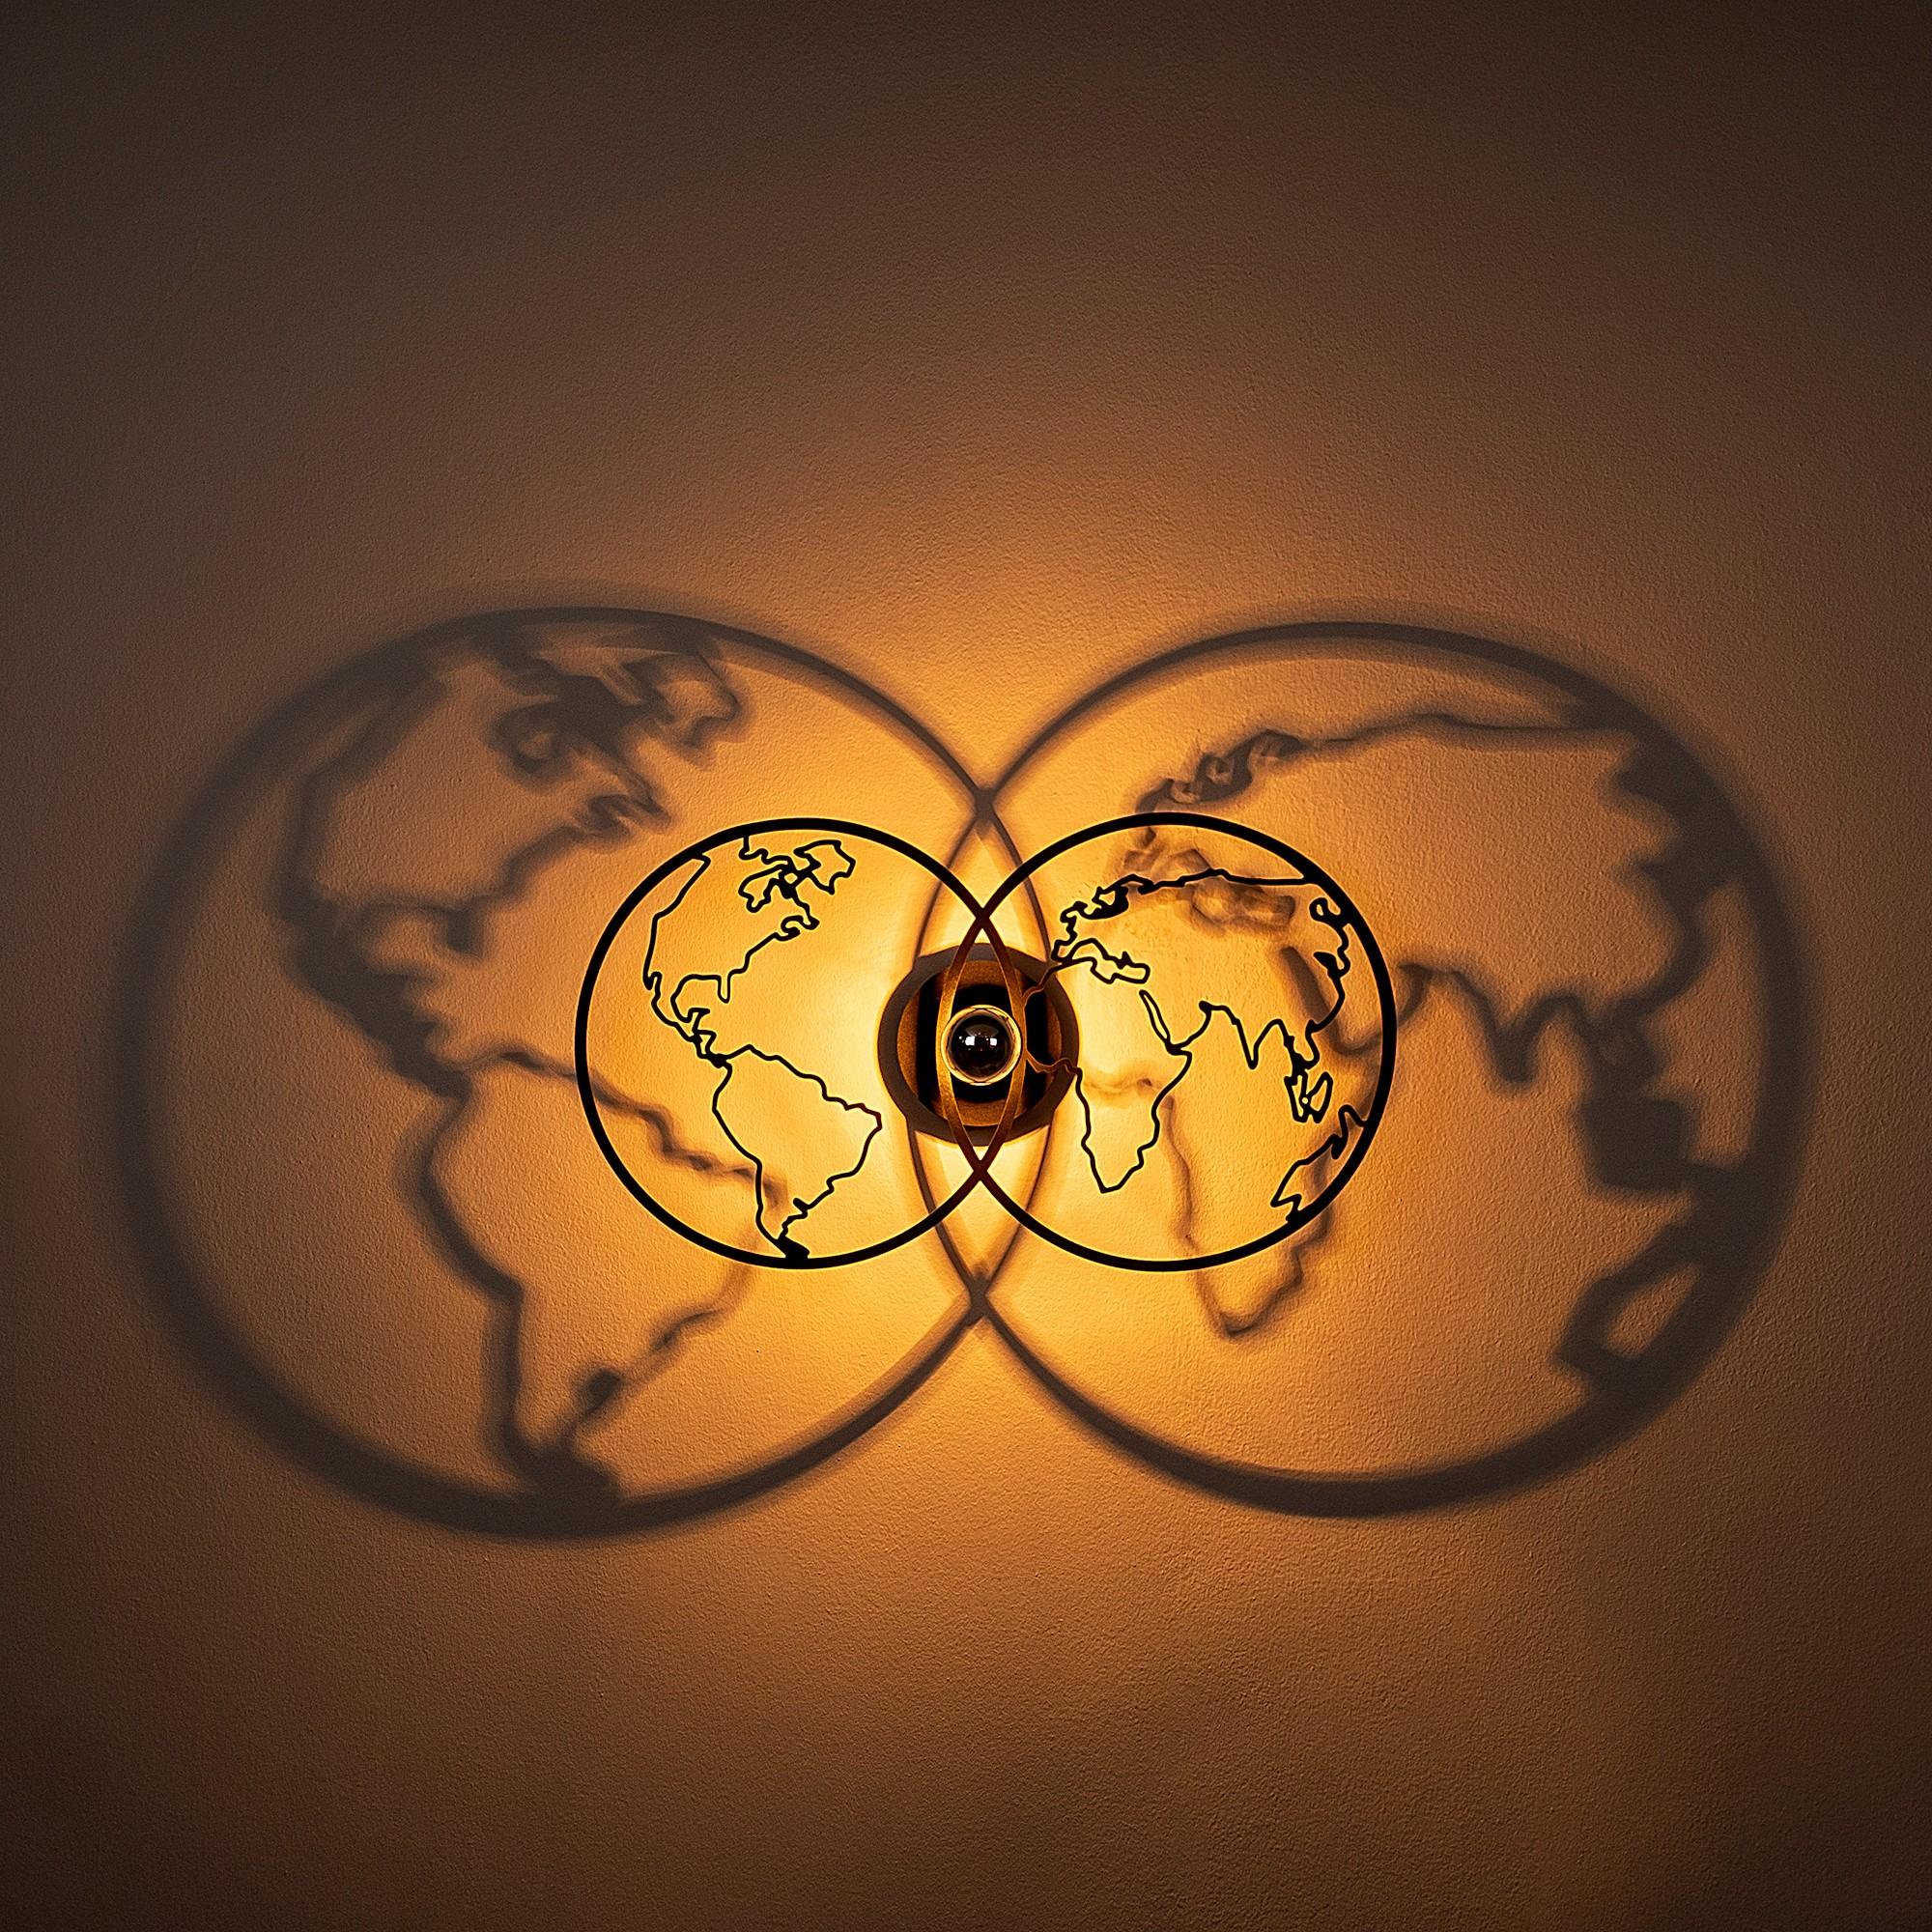 Industriële wanddecoratie lamp - E27 fitting - Wereldbol - dimbaar - E27 fitting - sfeerfoto 2